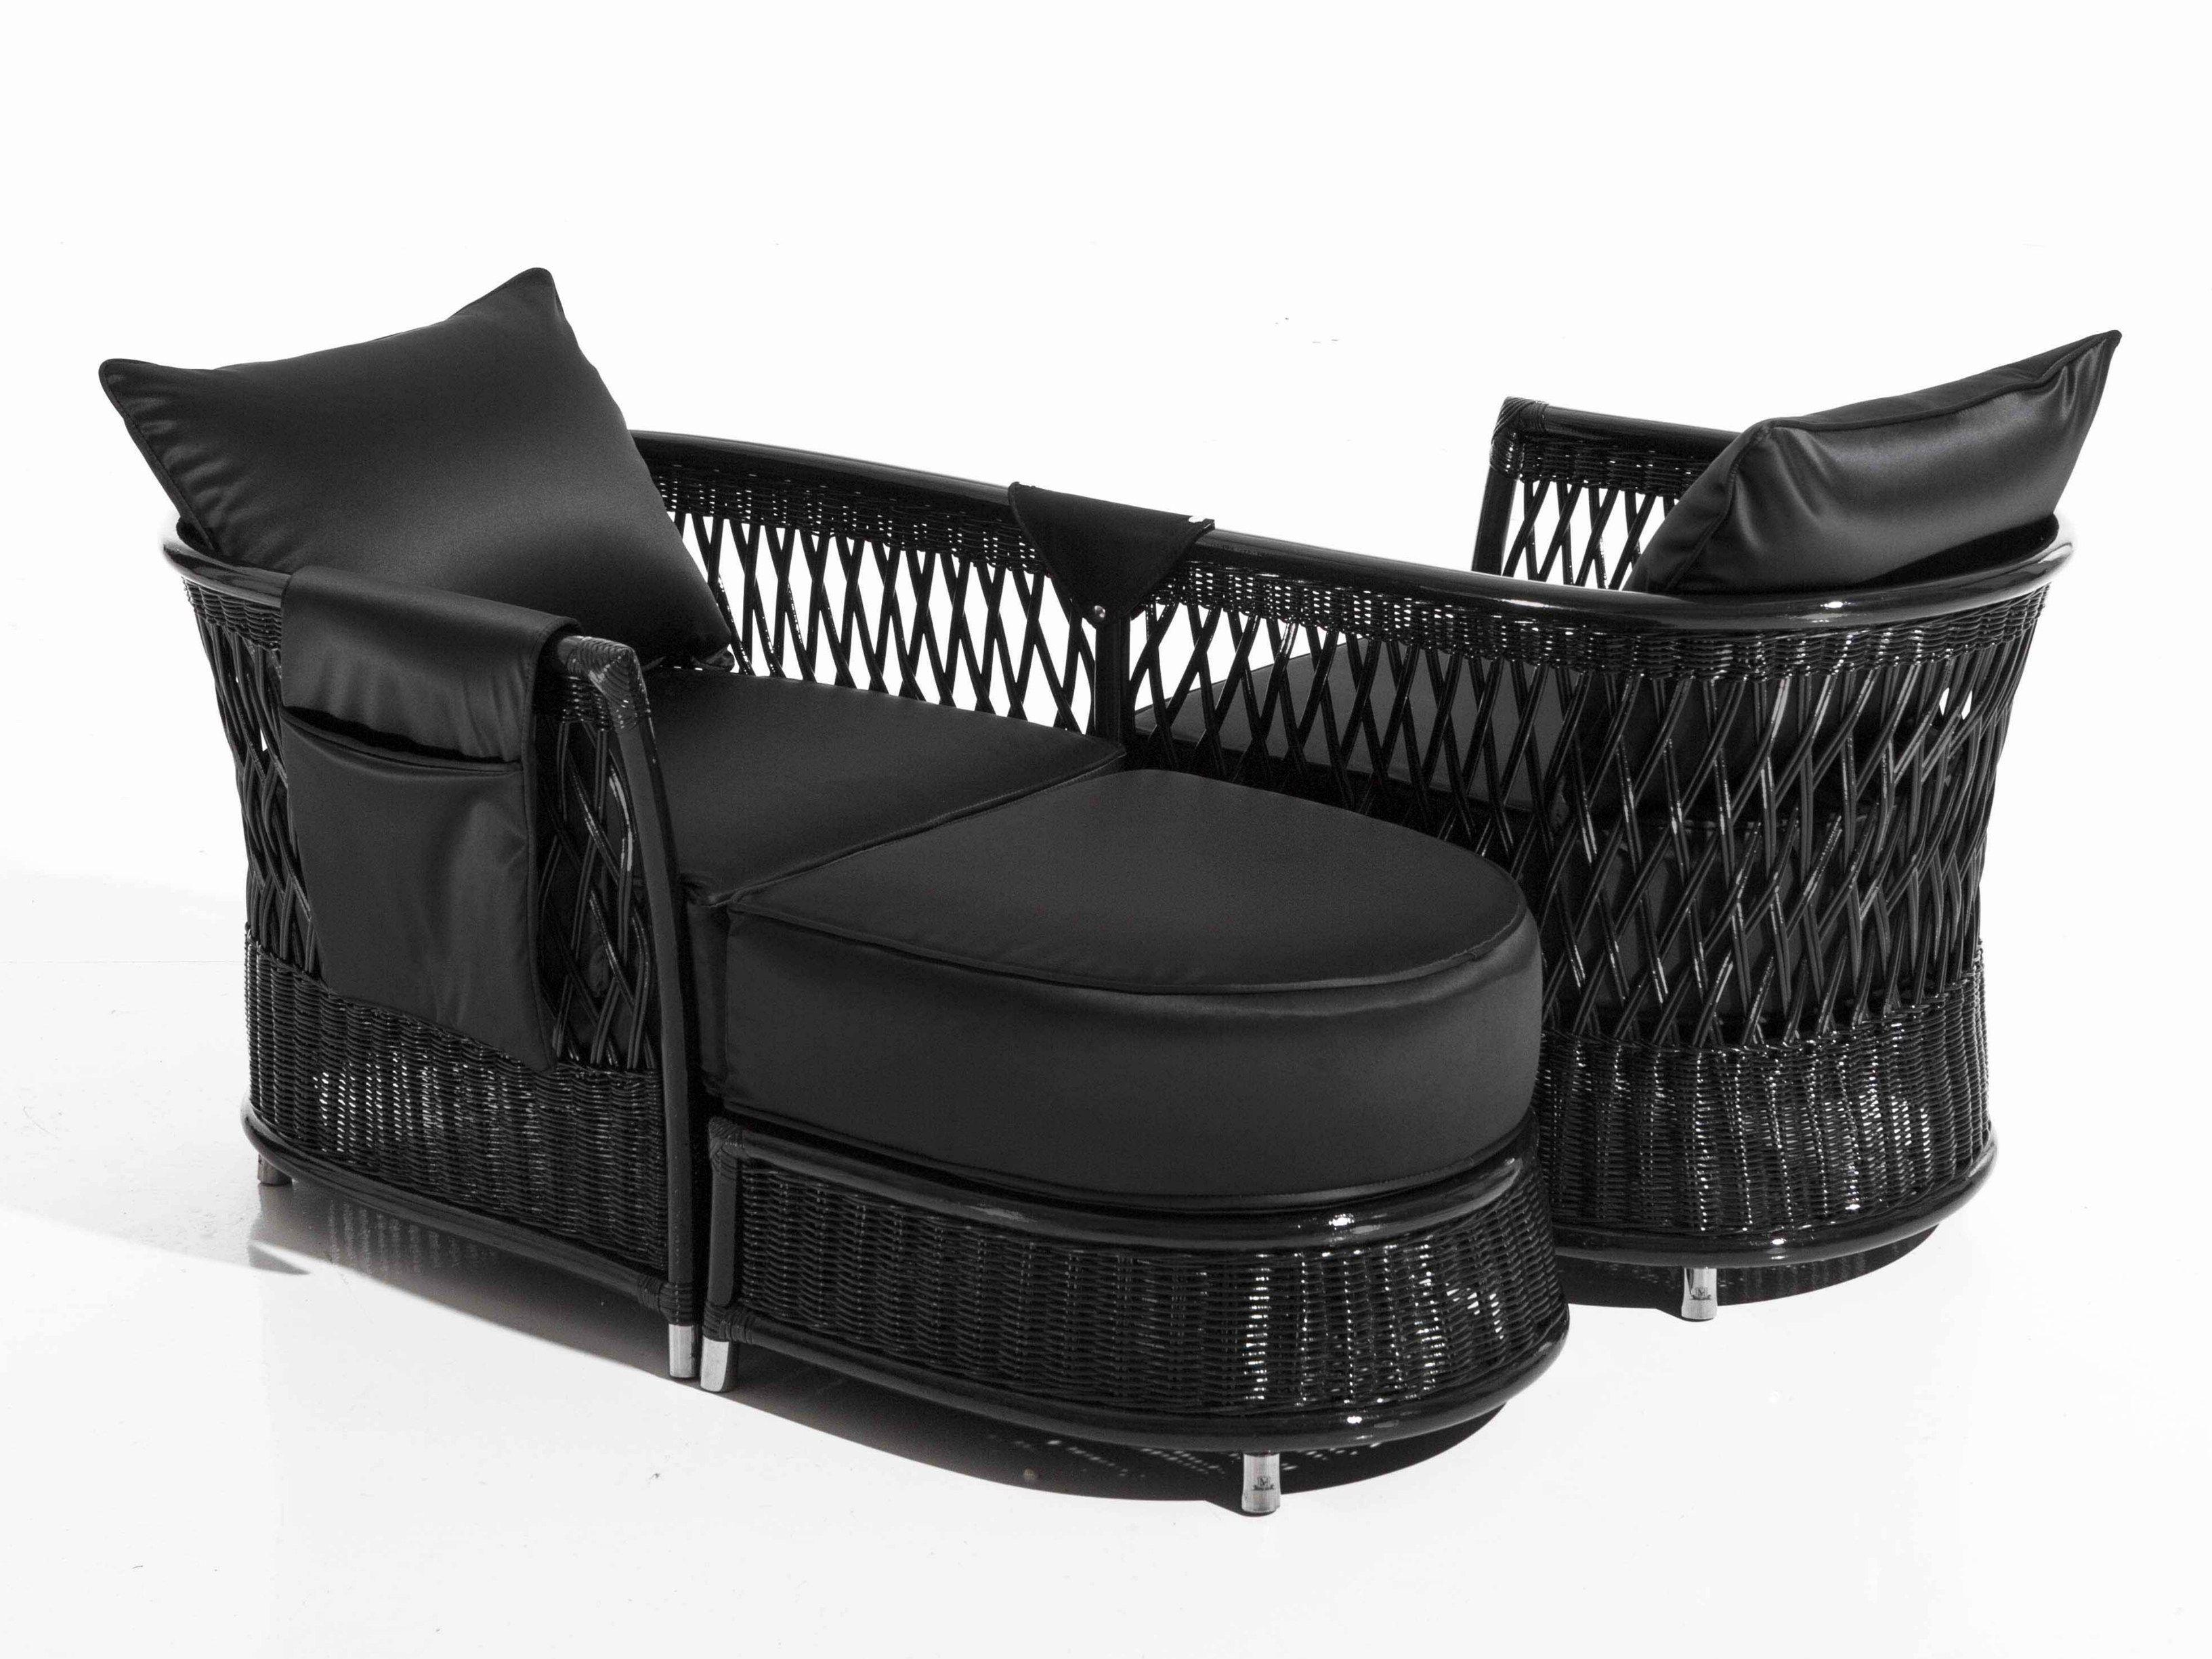 Vega | Garden Armchair By Samuele Mazza By Dfn Design Samuele Mazza Outdoor Lounge Vis A Vis